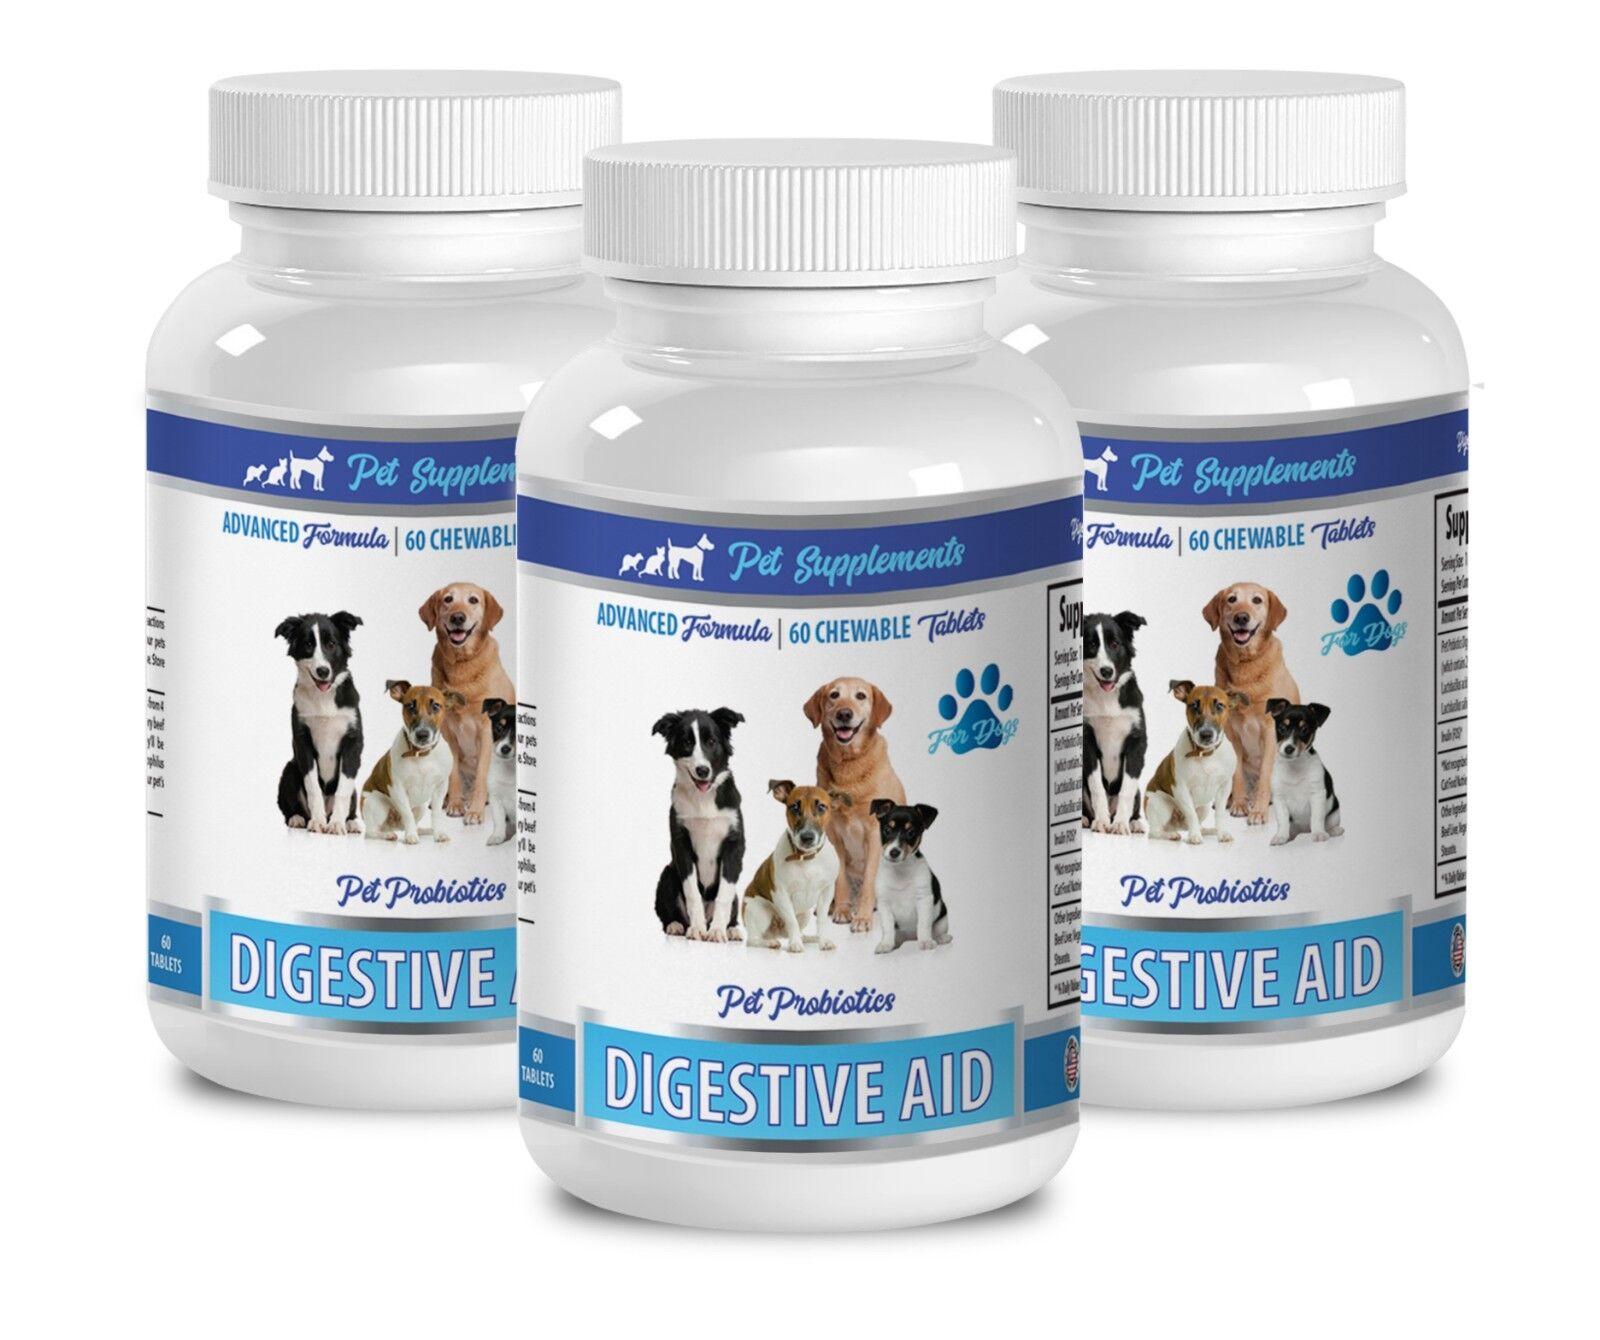 Digestive dog supplement - DOG DIGESTIVE ENZYMES AID 3B - bifidobacterium longum